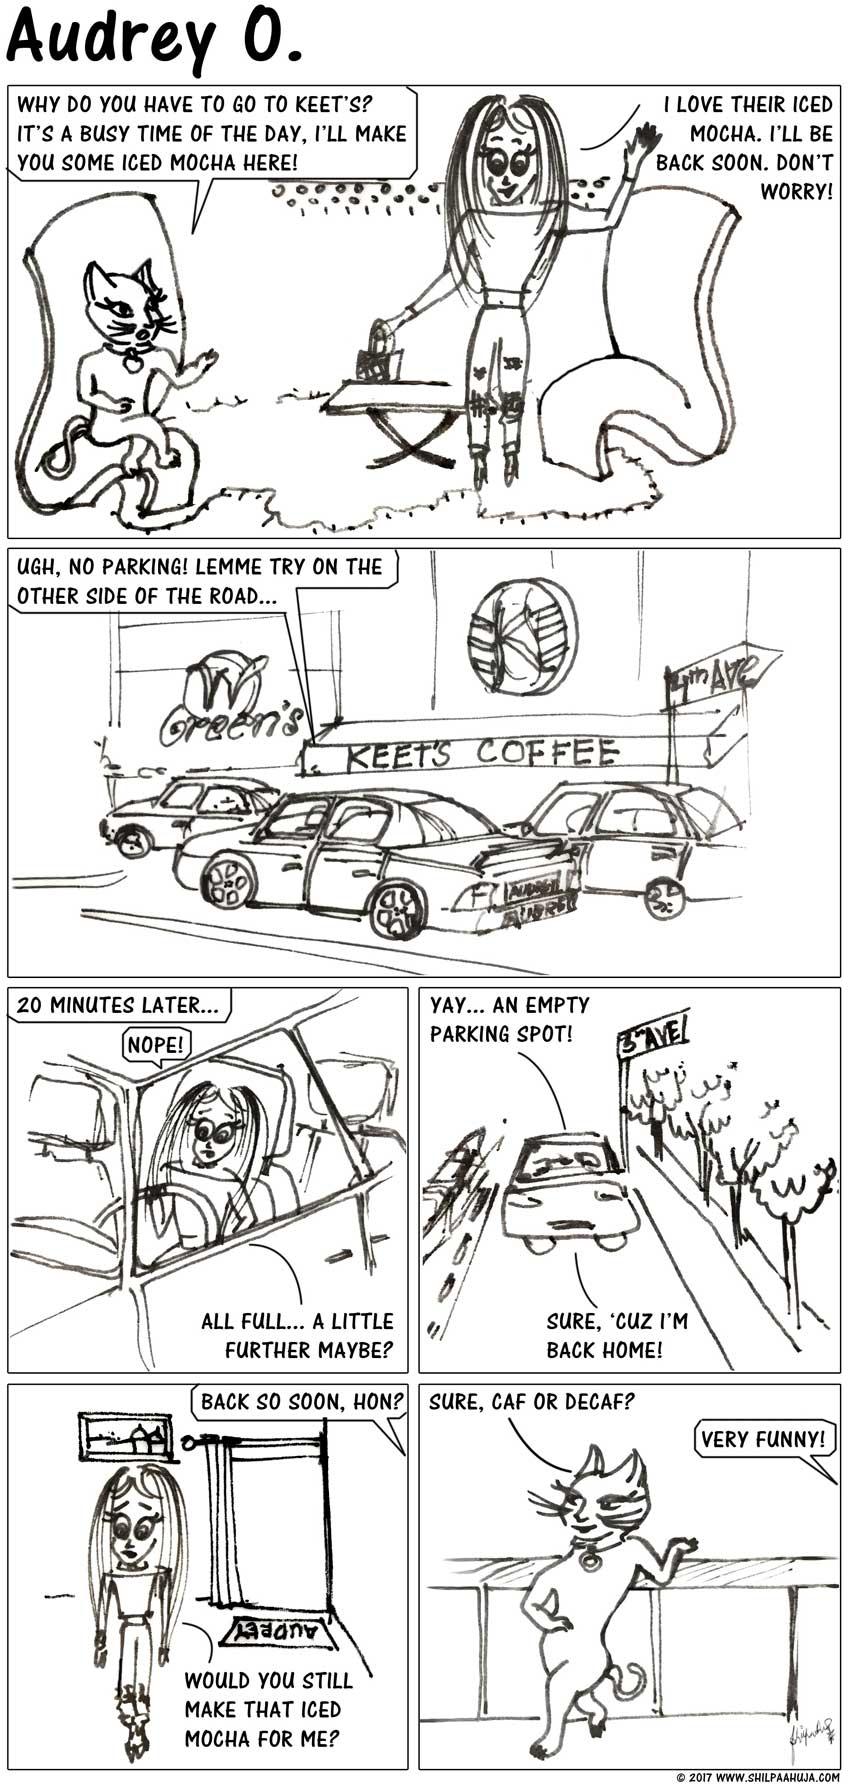 audrey-o-comic-v1e34-girl-cartoon-how-to-find-parking-jokes-memes-funny